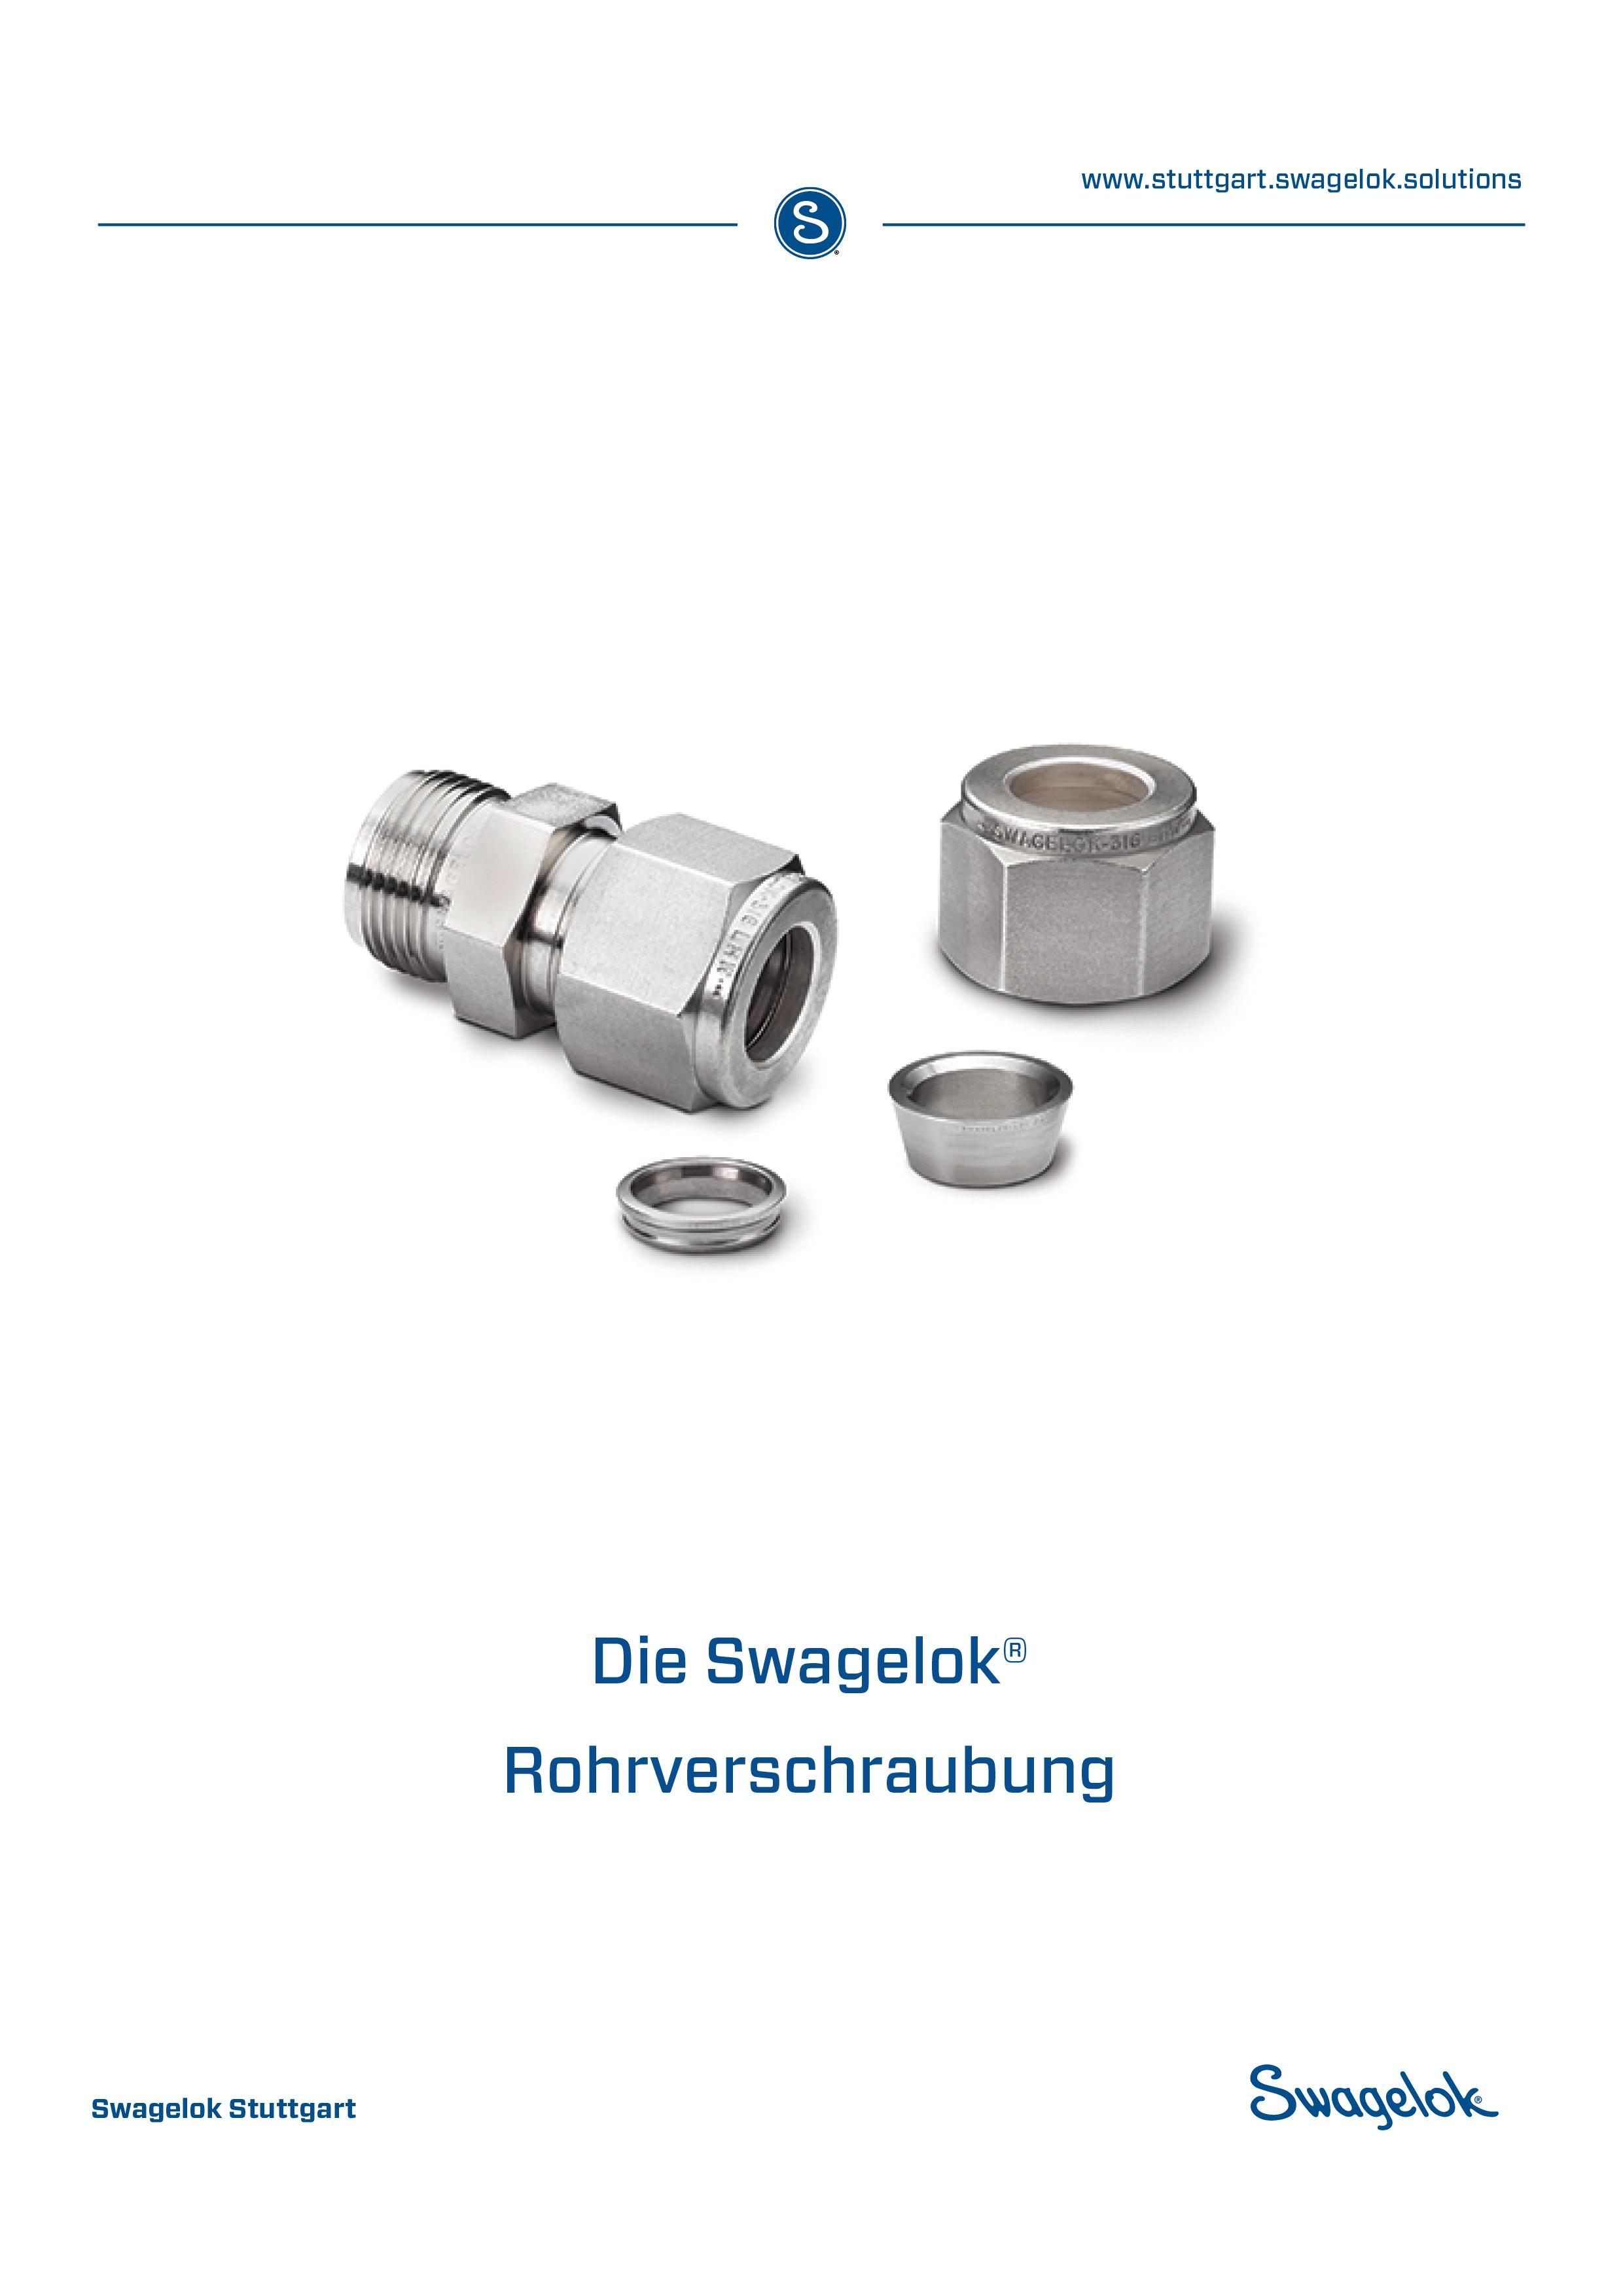 websiteheader_Rohrverschraubung3